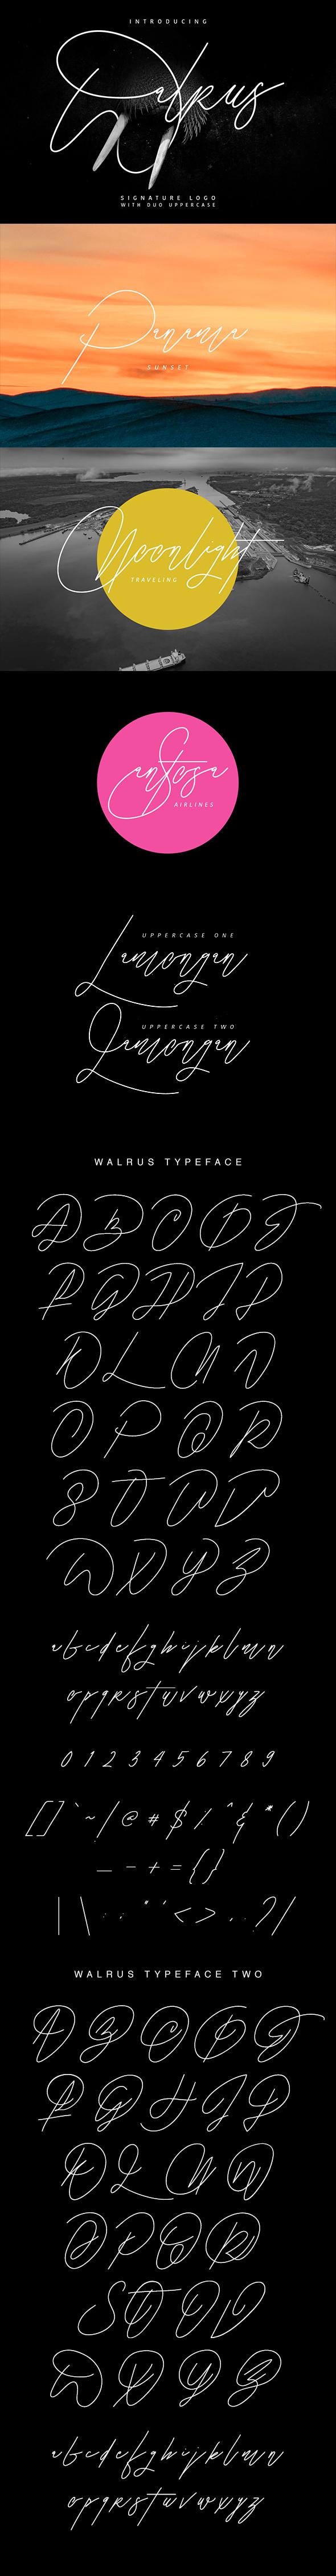 Walrus Signature Font - Hand-writing Script